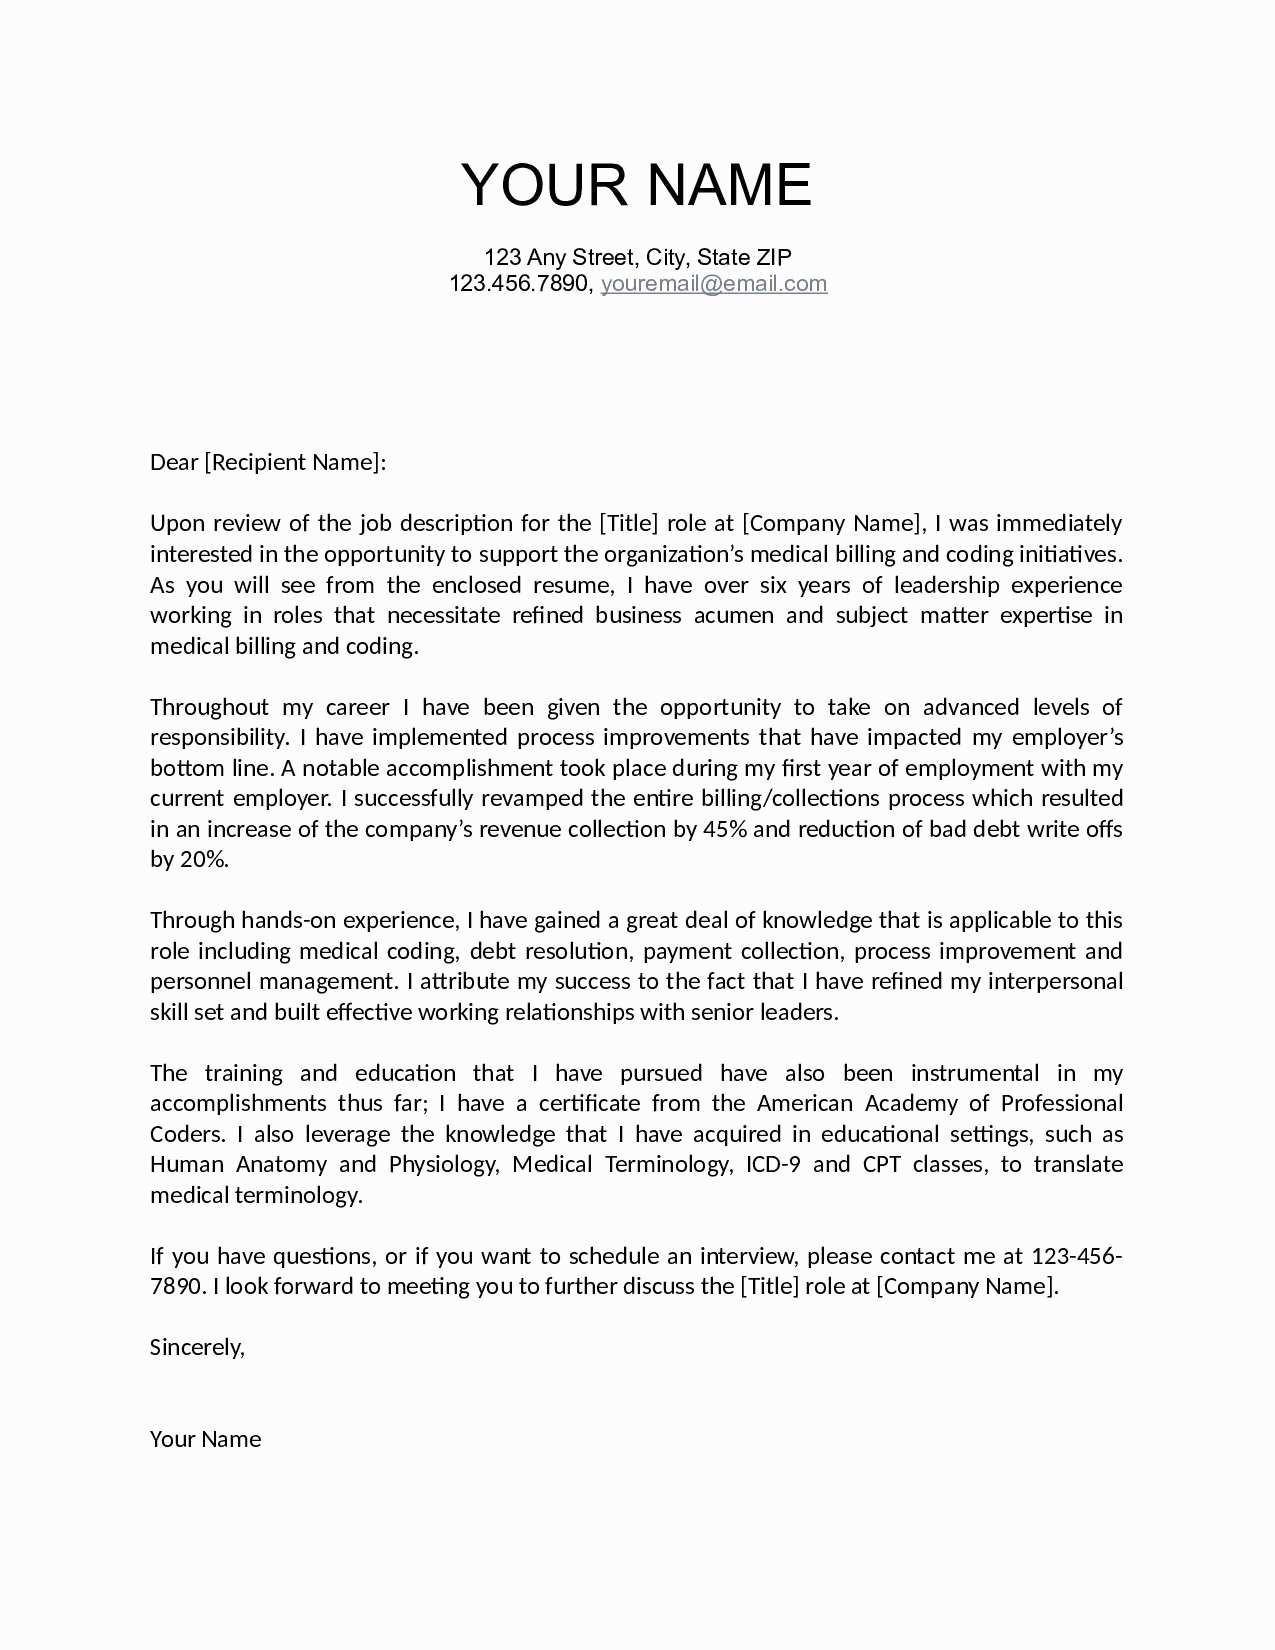 Confirmation Letter Template - Sample Confirmation Letter for Job Refrence Best Job Fer Letter